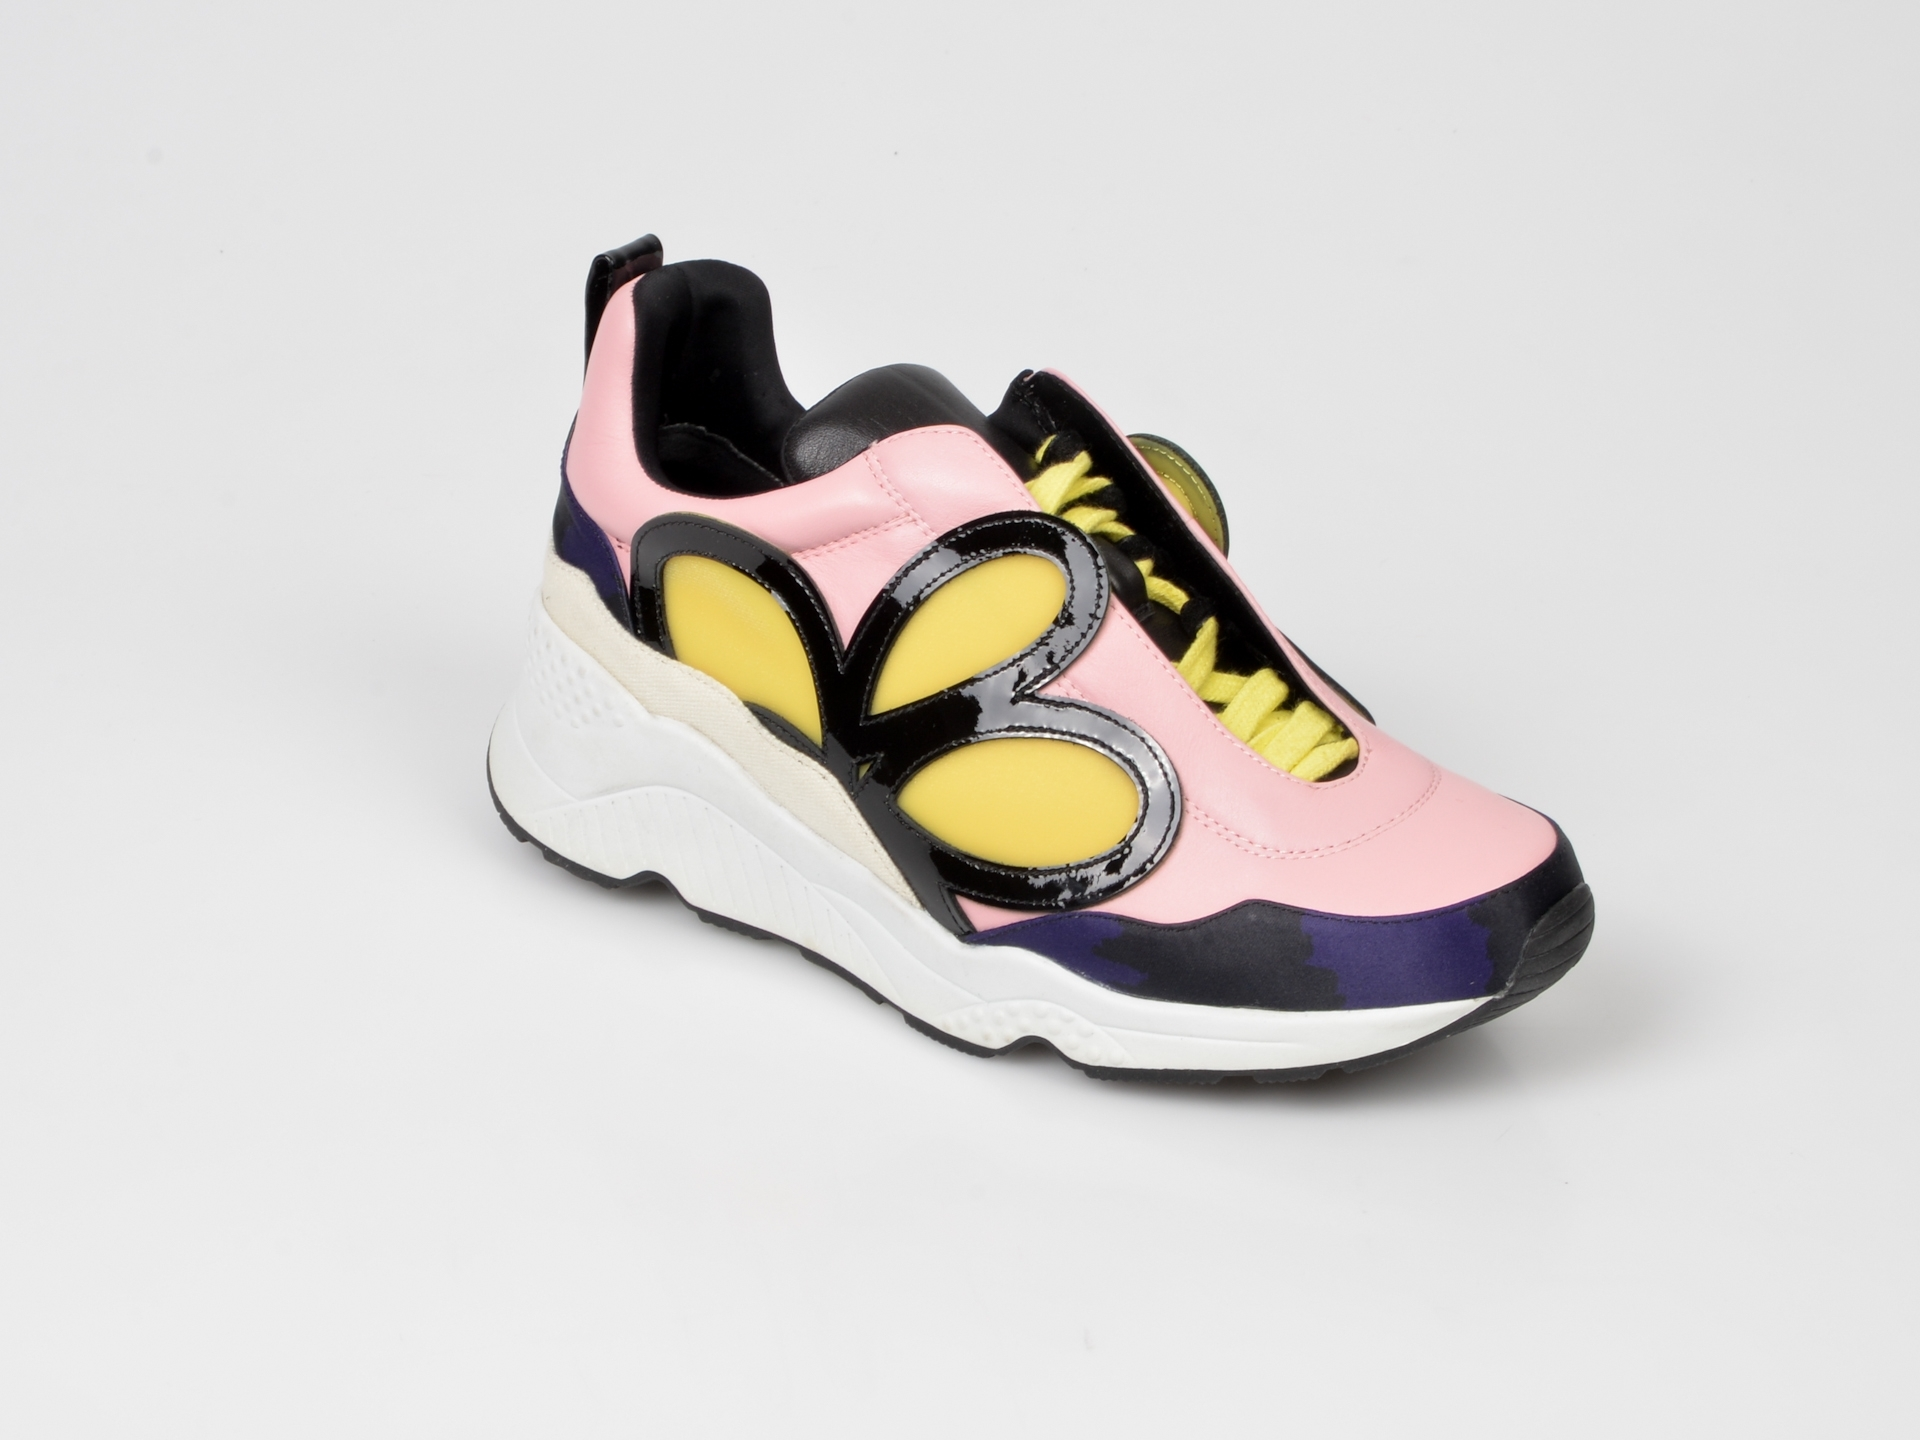 Pantofi sport KAT MACONIE FOR EPICA roz, din piele ecologica